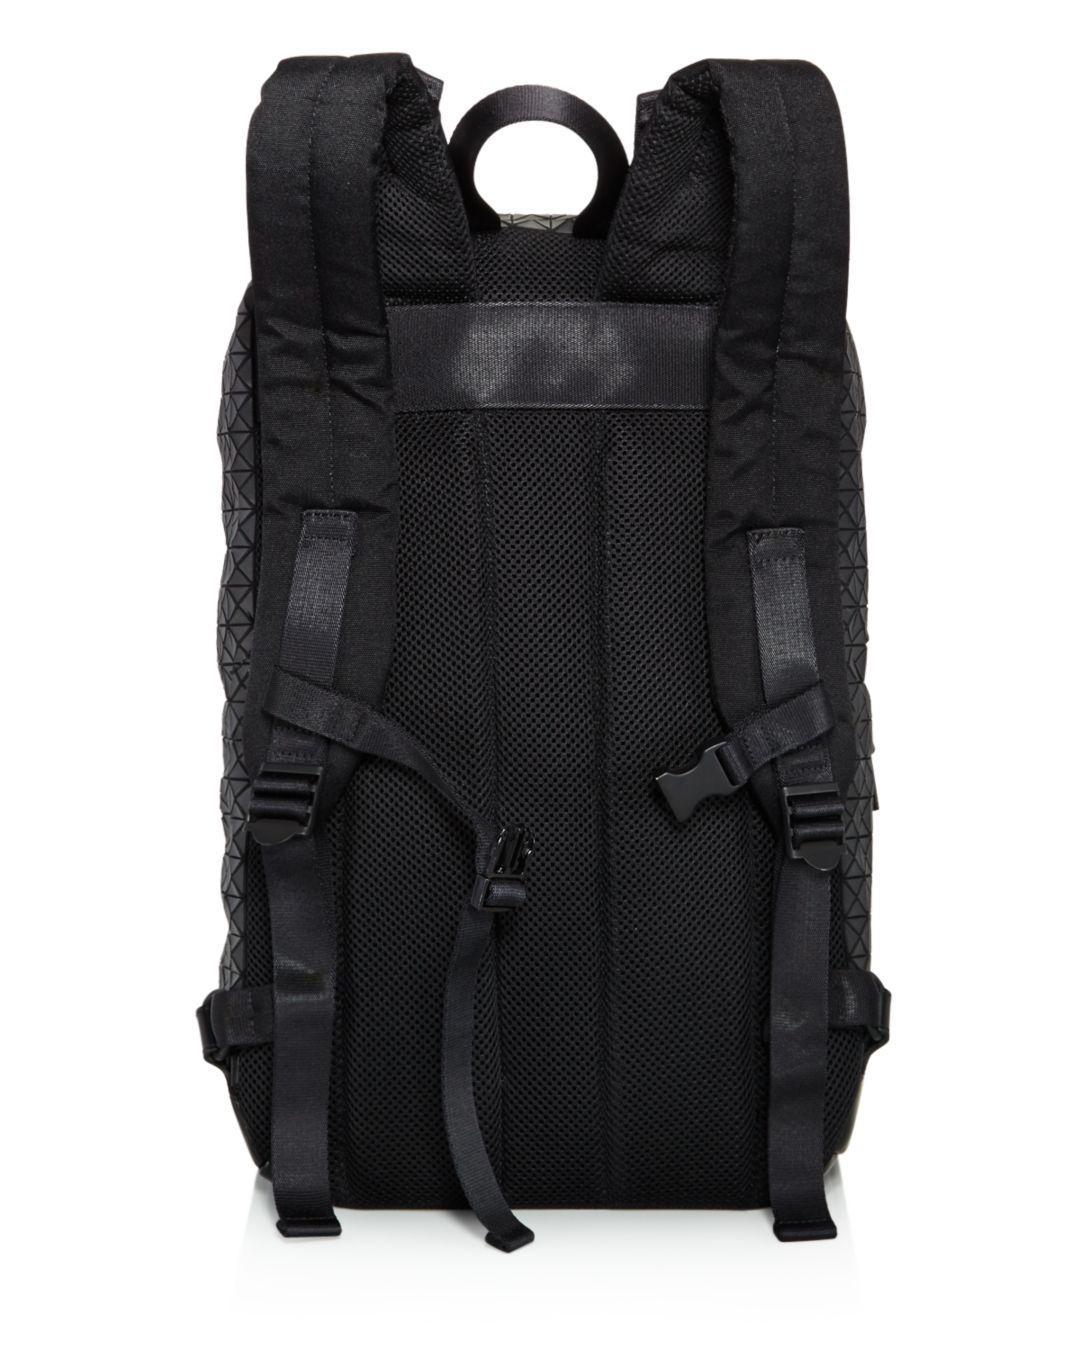 Bao Bao Issey Miyake Hiker Geometric Backpack in Black for Men - Lyst d92c9287335f9